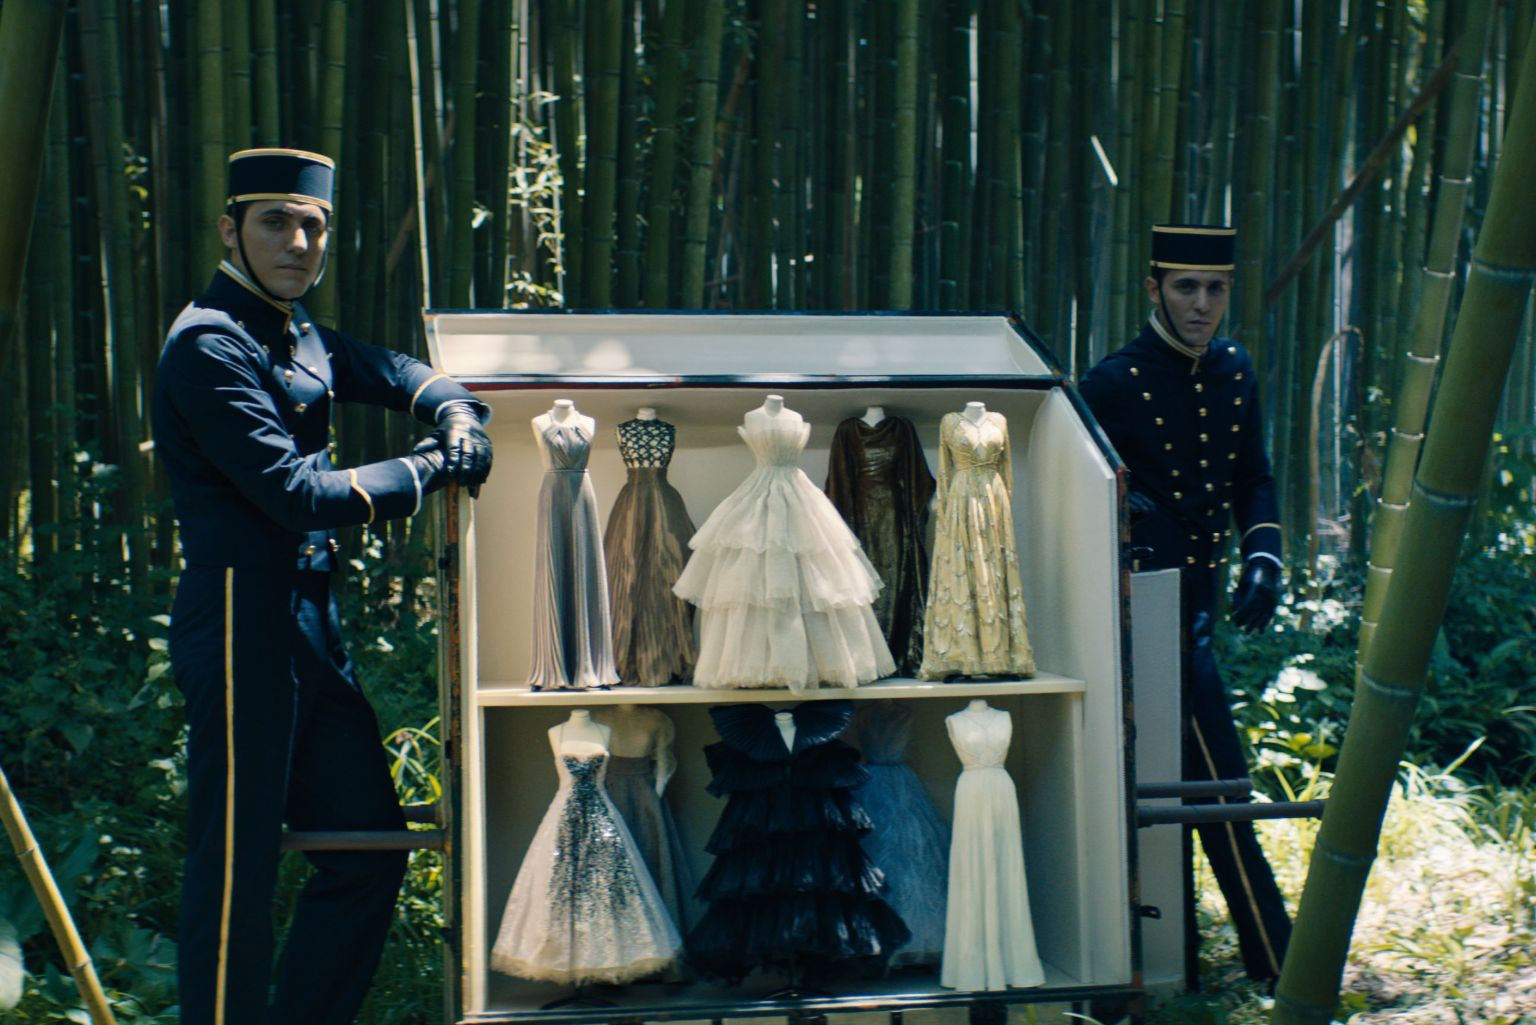 Dior couture film